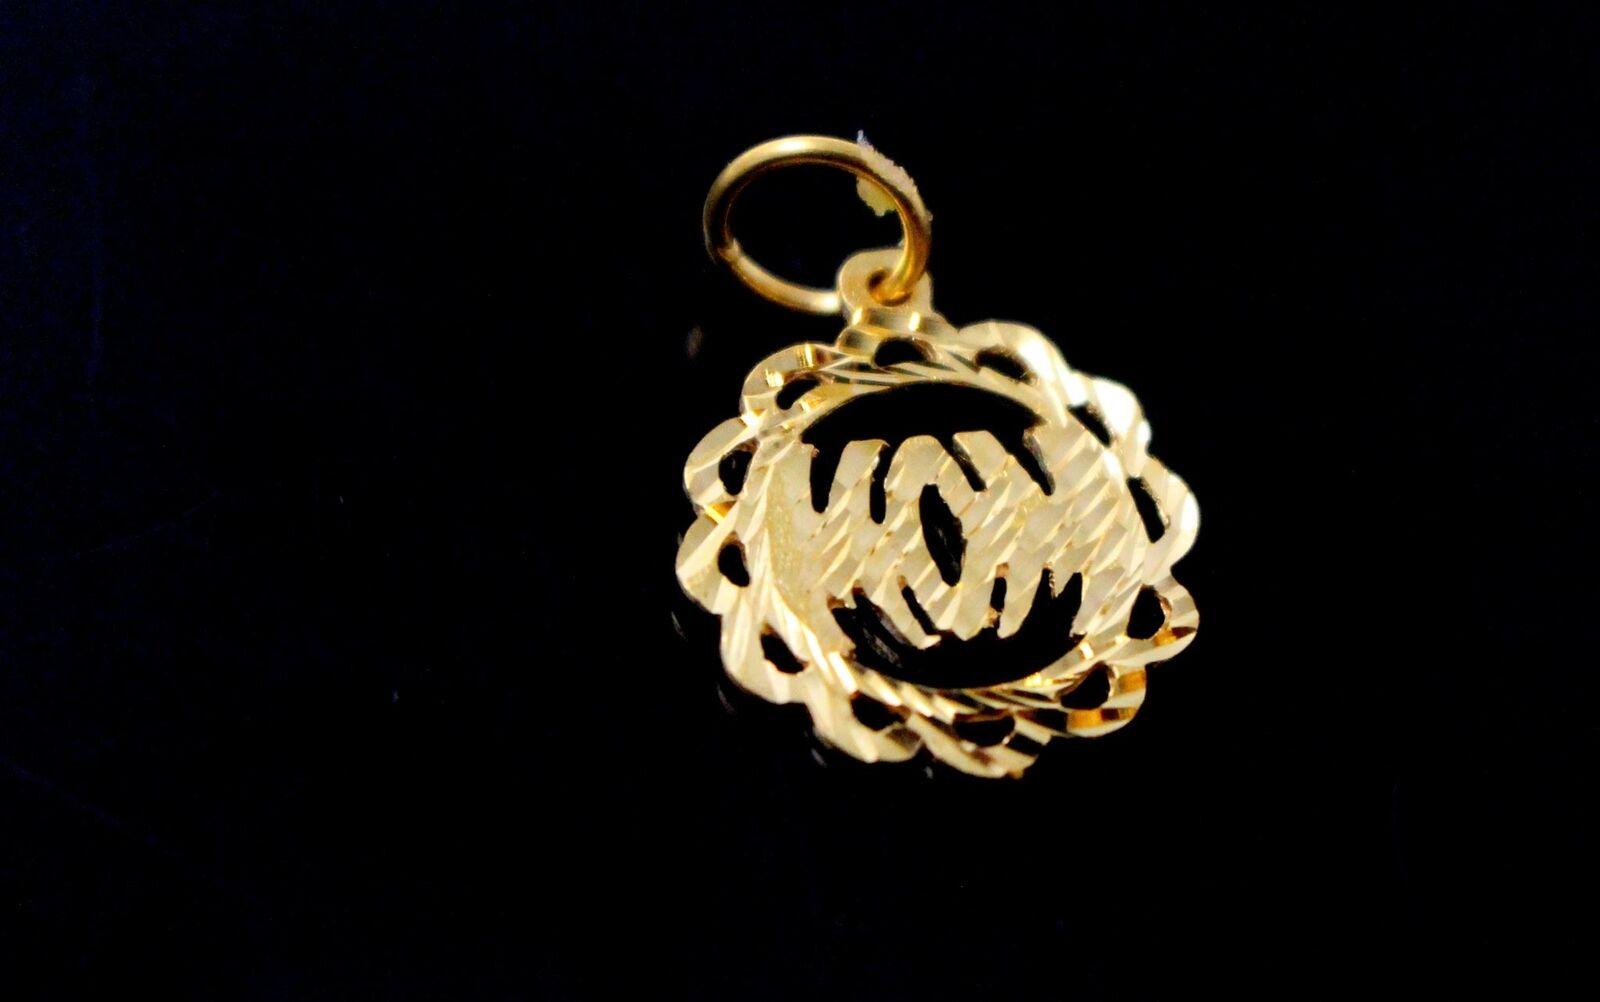 22k 22ct Solid gold Charm Mom Pendant Round Design p1227 ns